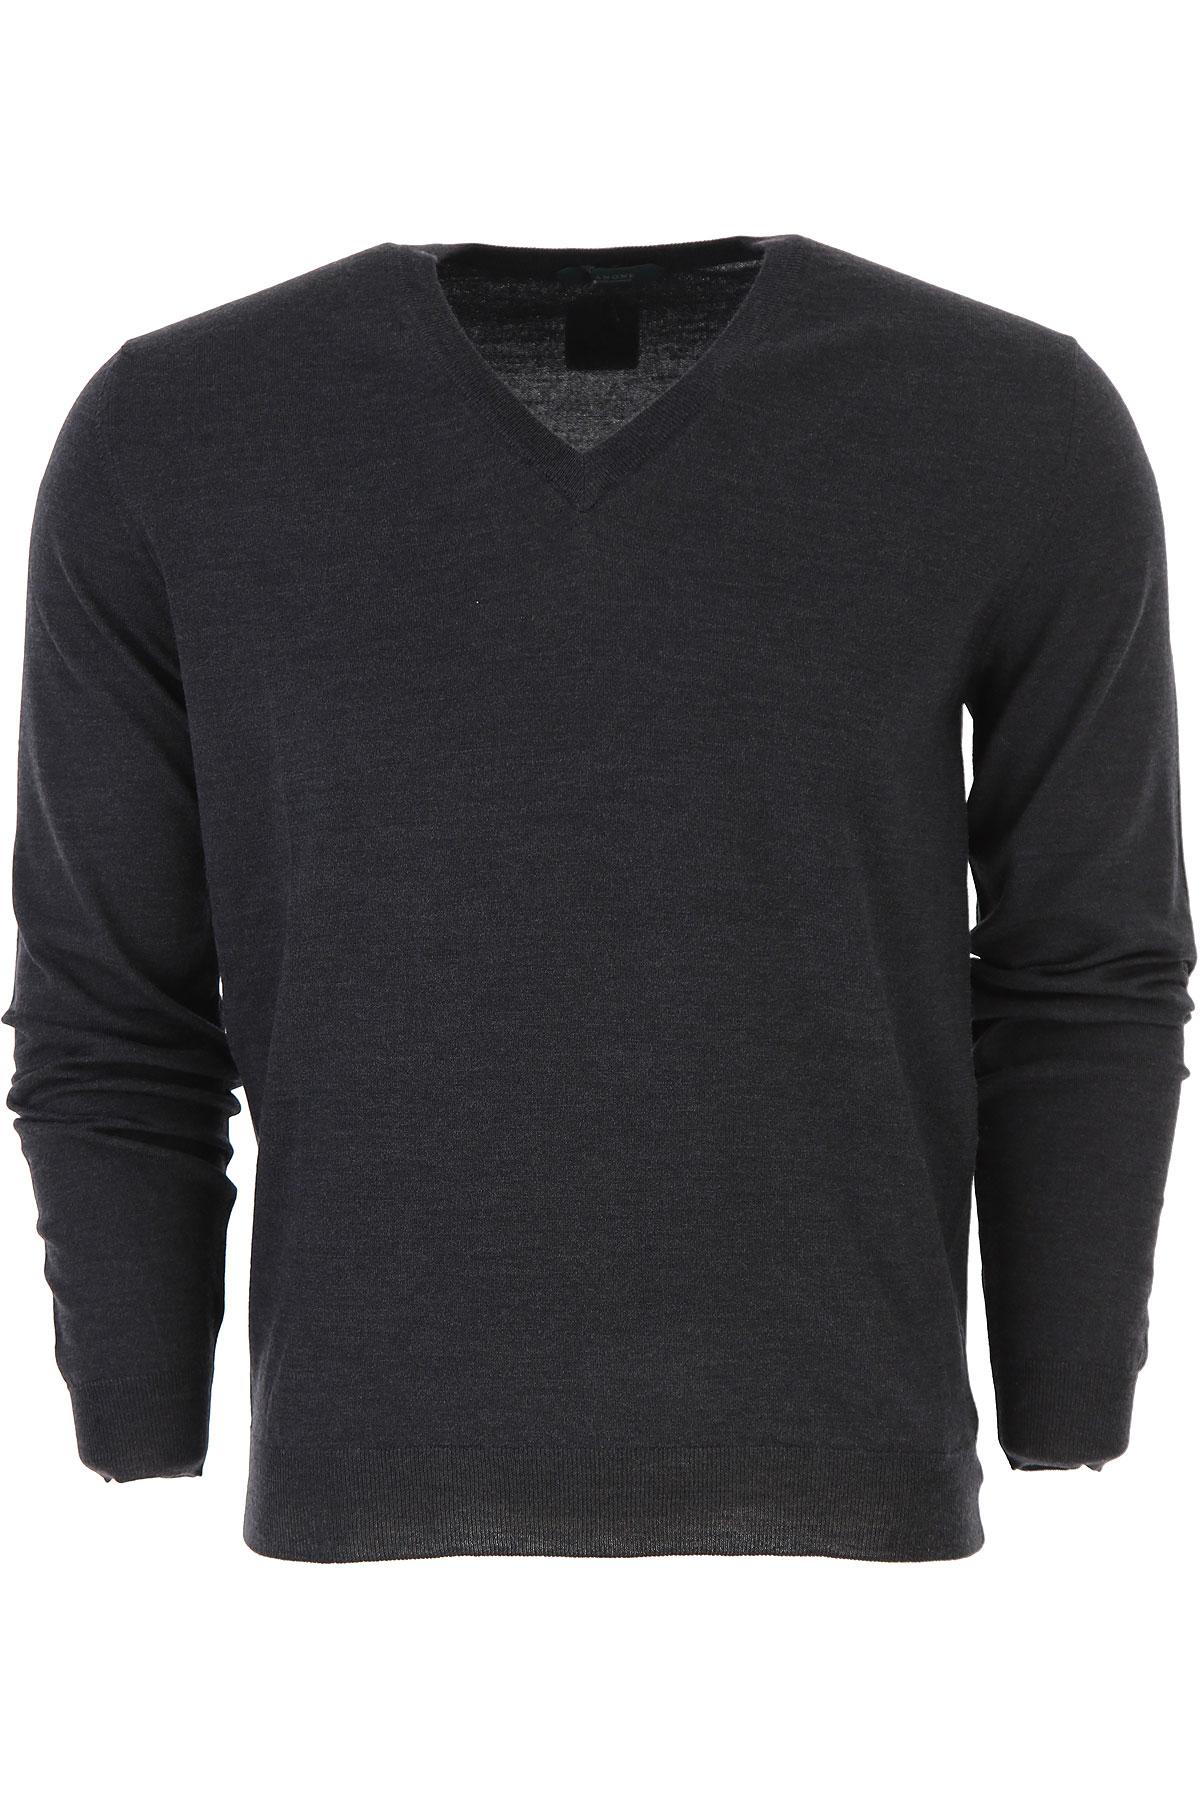 Zanone Sweater for Men Jumper On Sale, Dark Anthracite Grey, Virgin wool, 2019, L M S